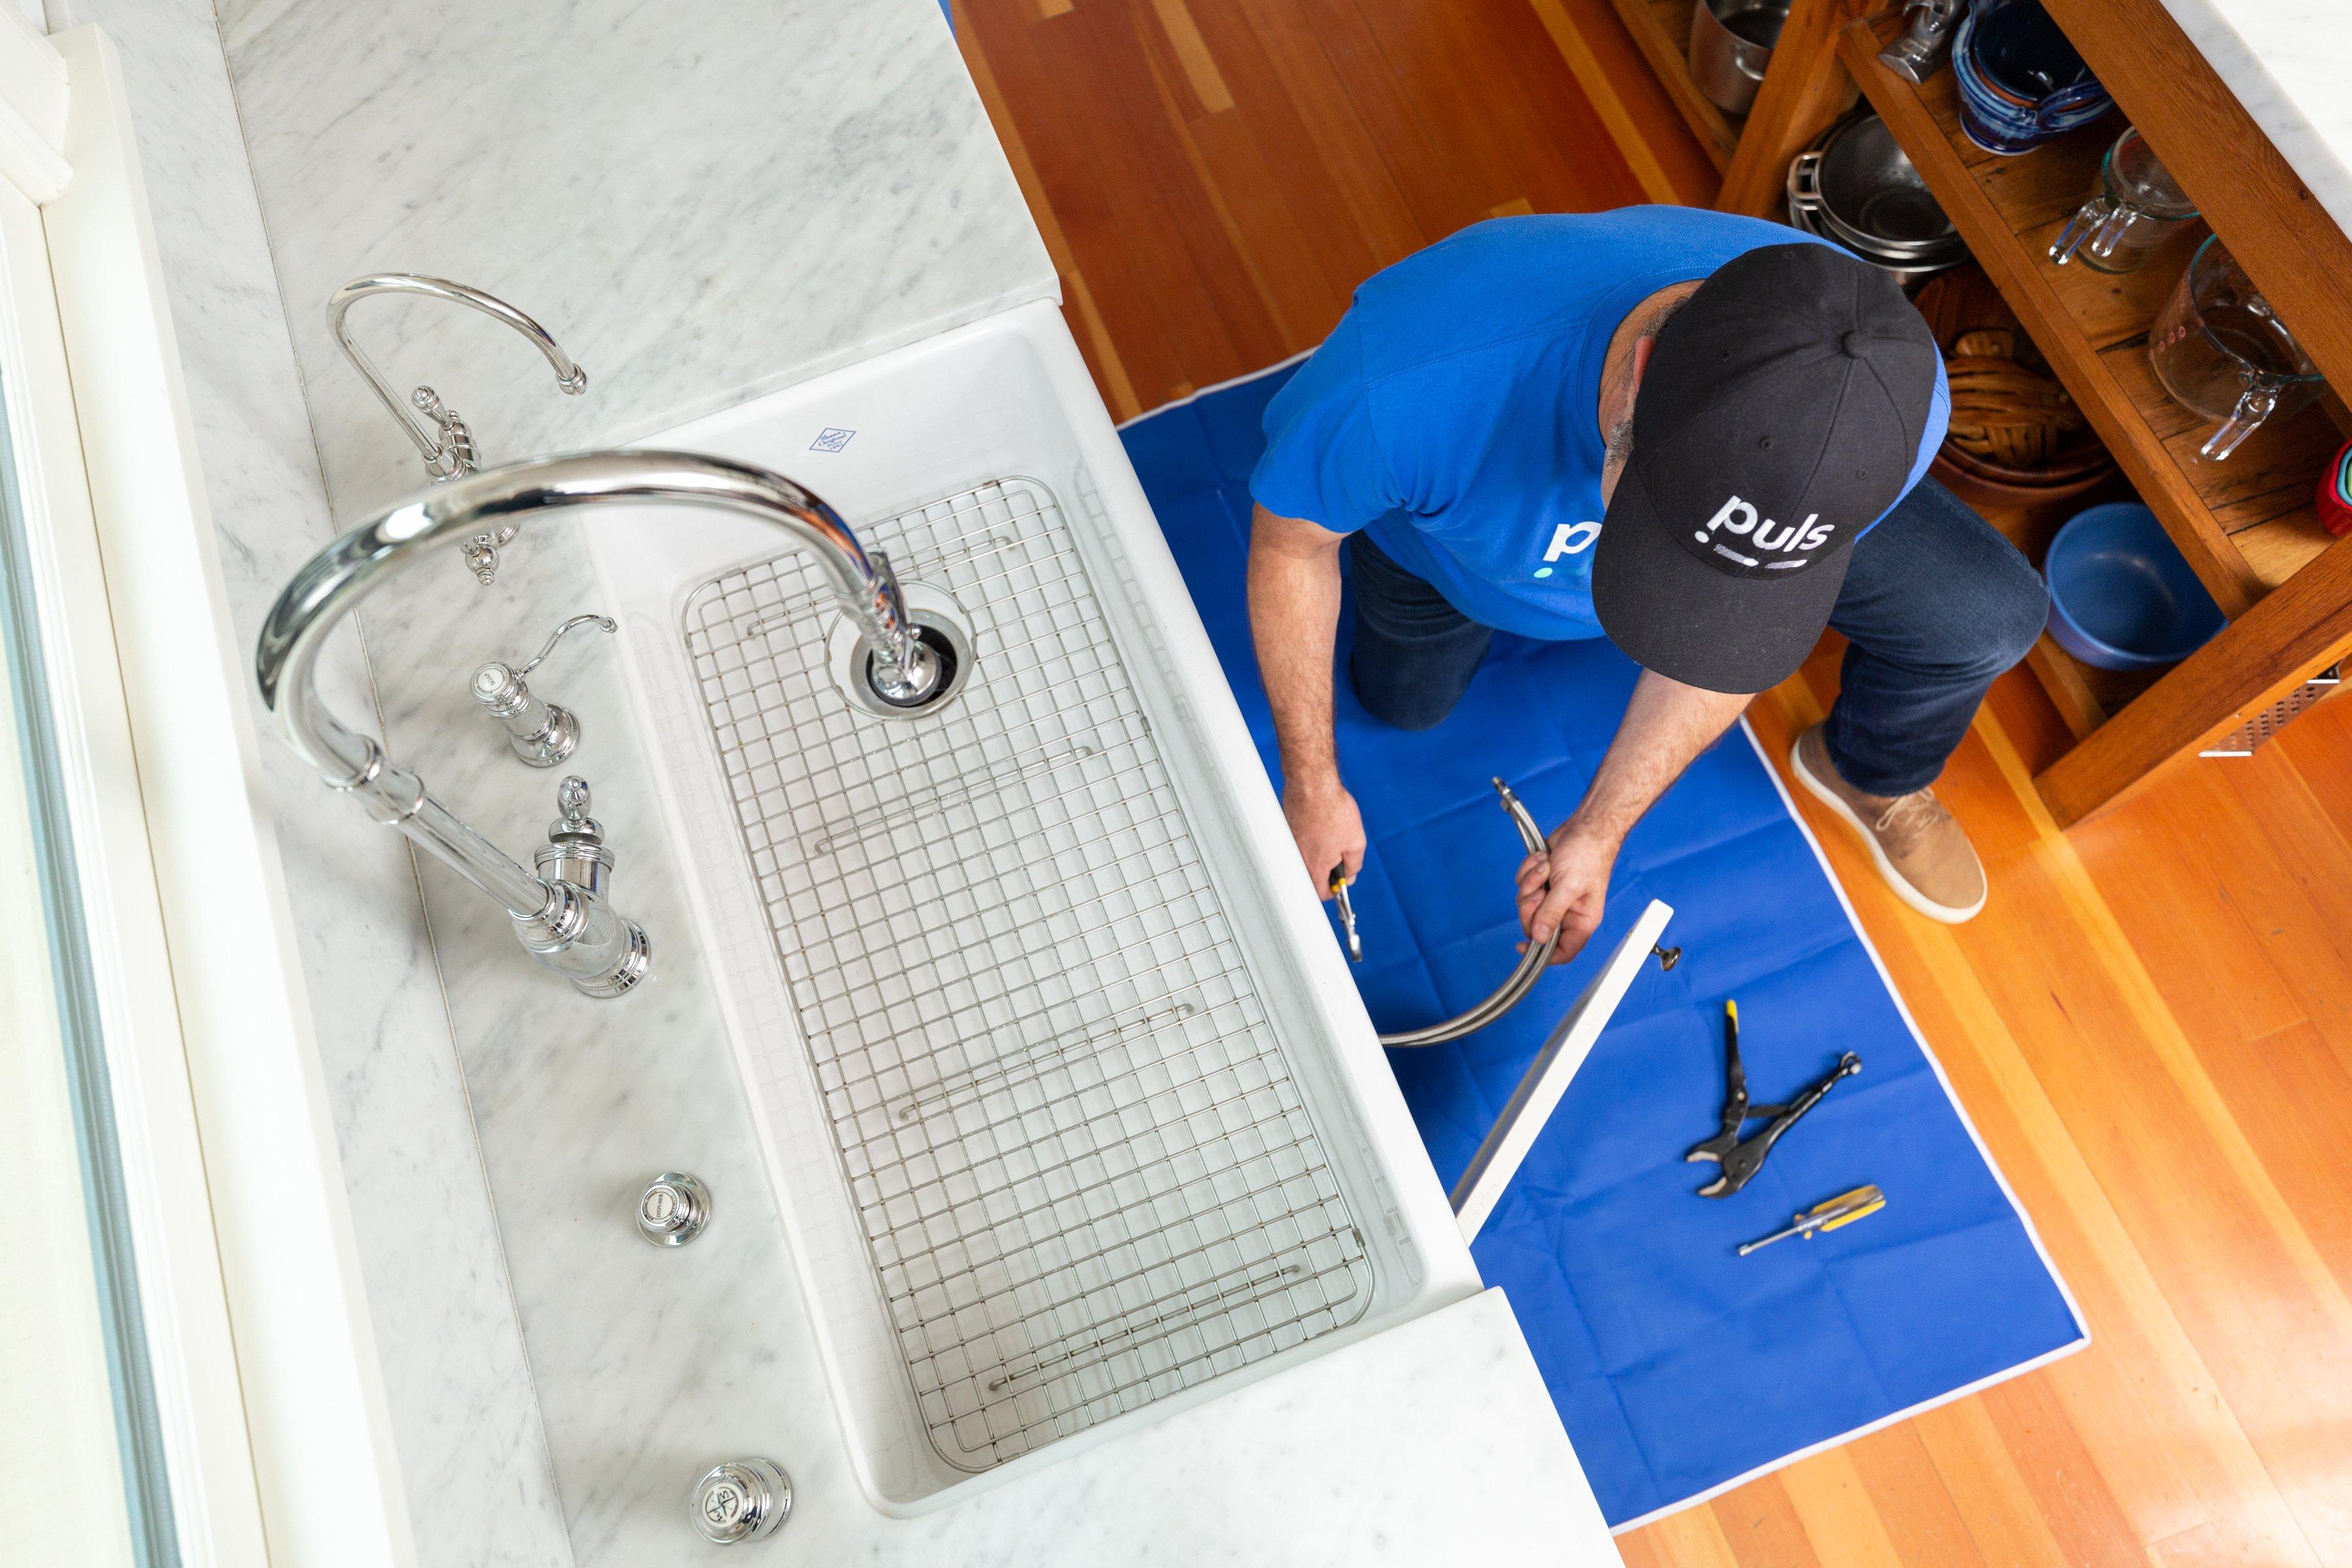 Handymen can help with plumbing needs.